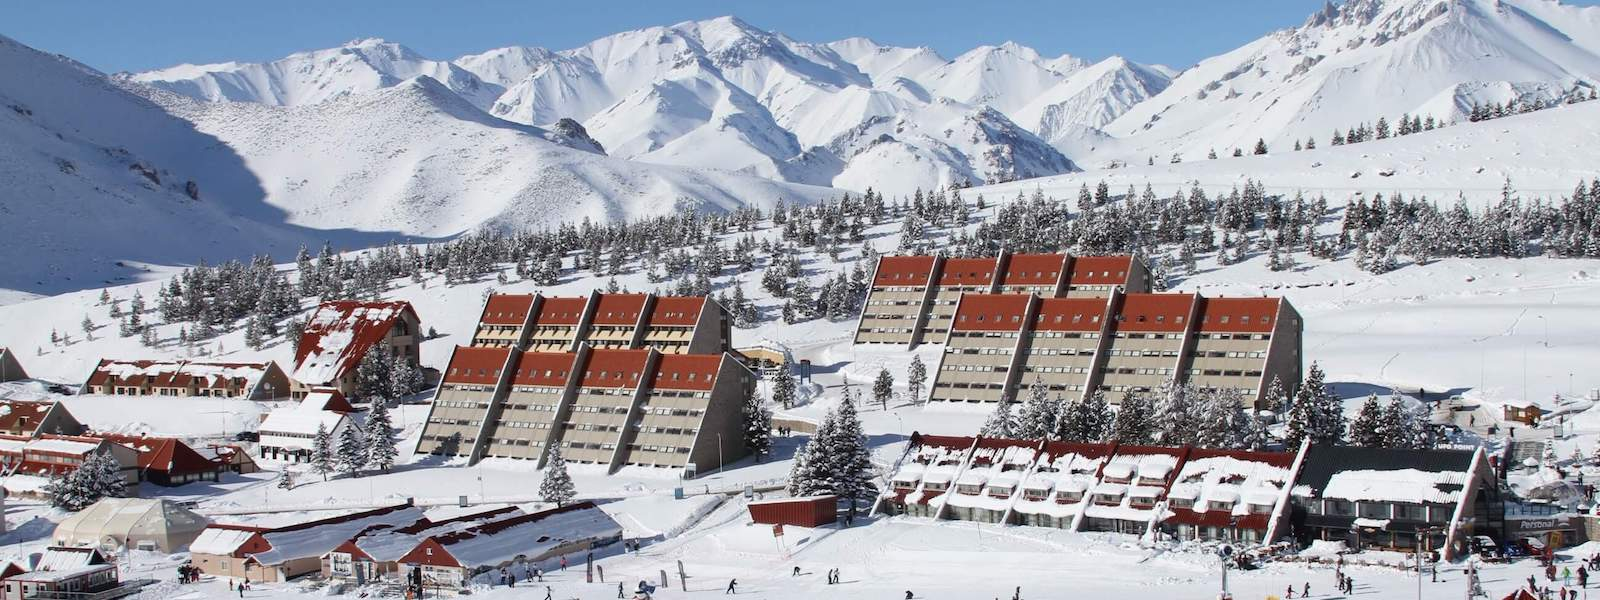 las lenas ski resort in argentina